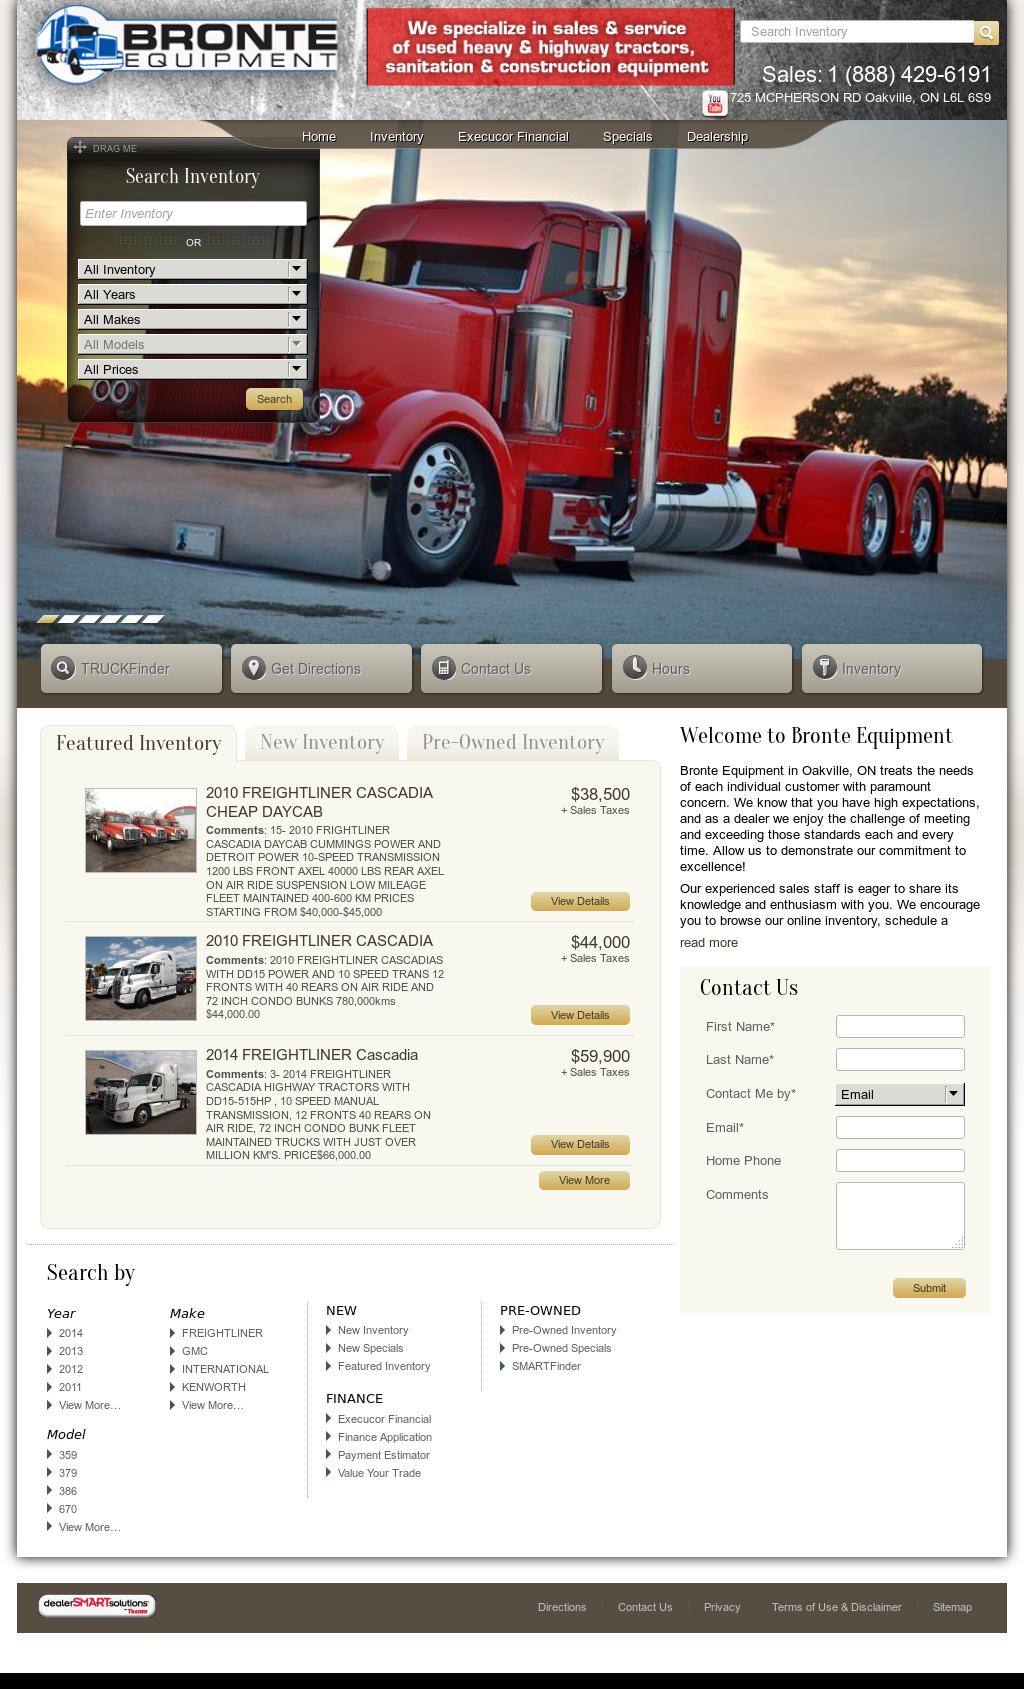 Bronte Equipment Truck Sales Competitors, Revenue and